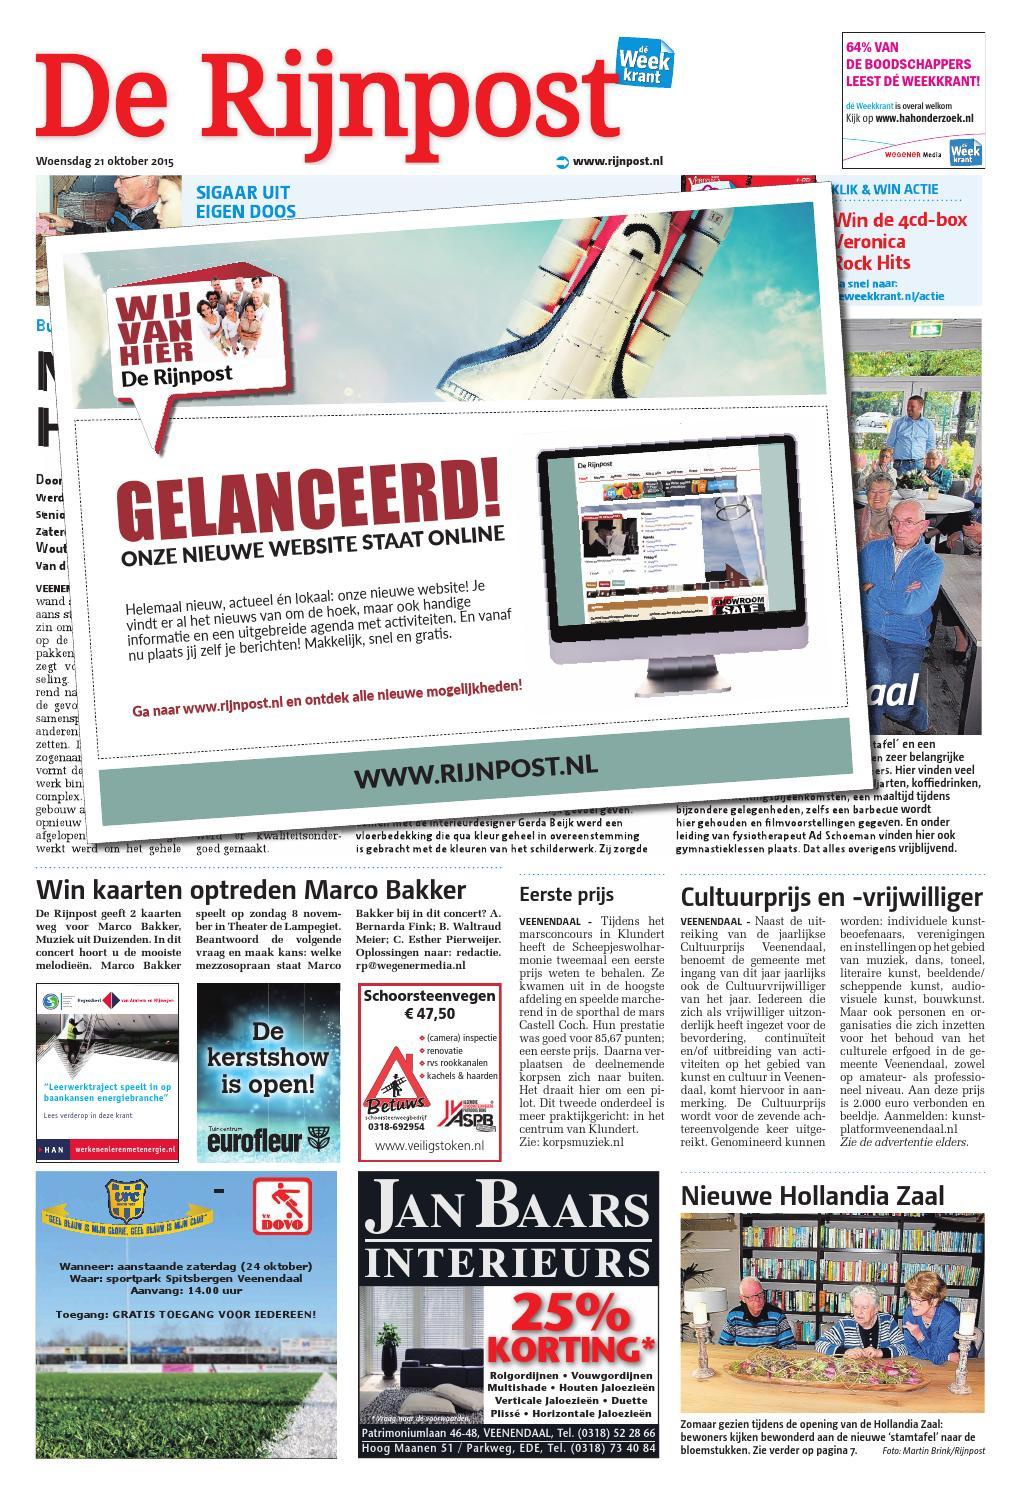 De Rijnpost week43 by Wegener - issuu